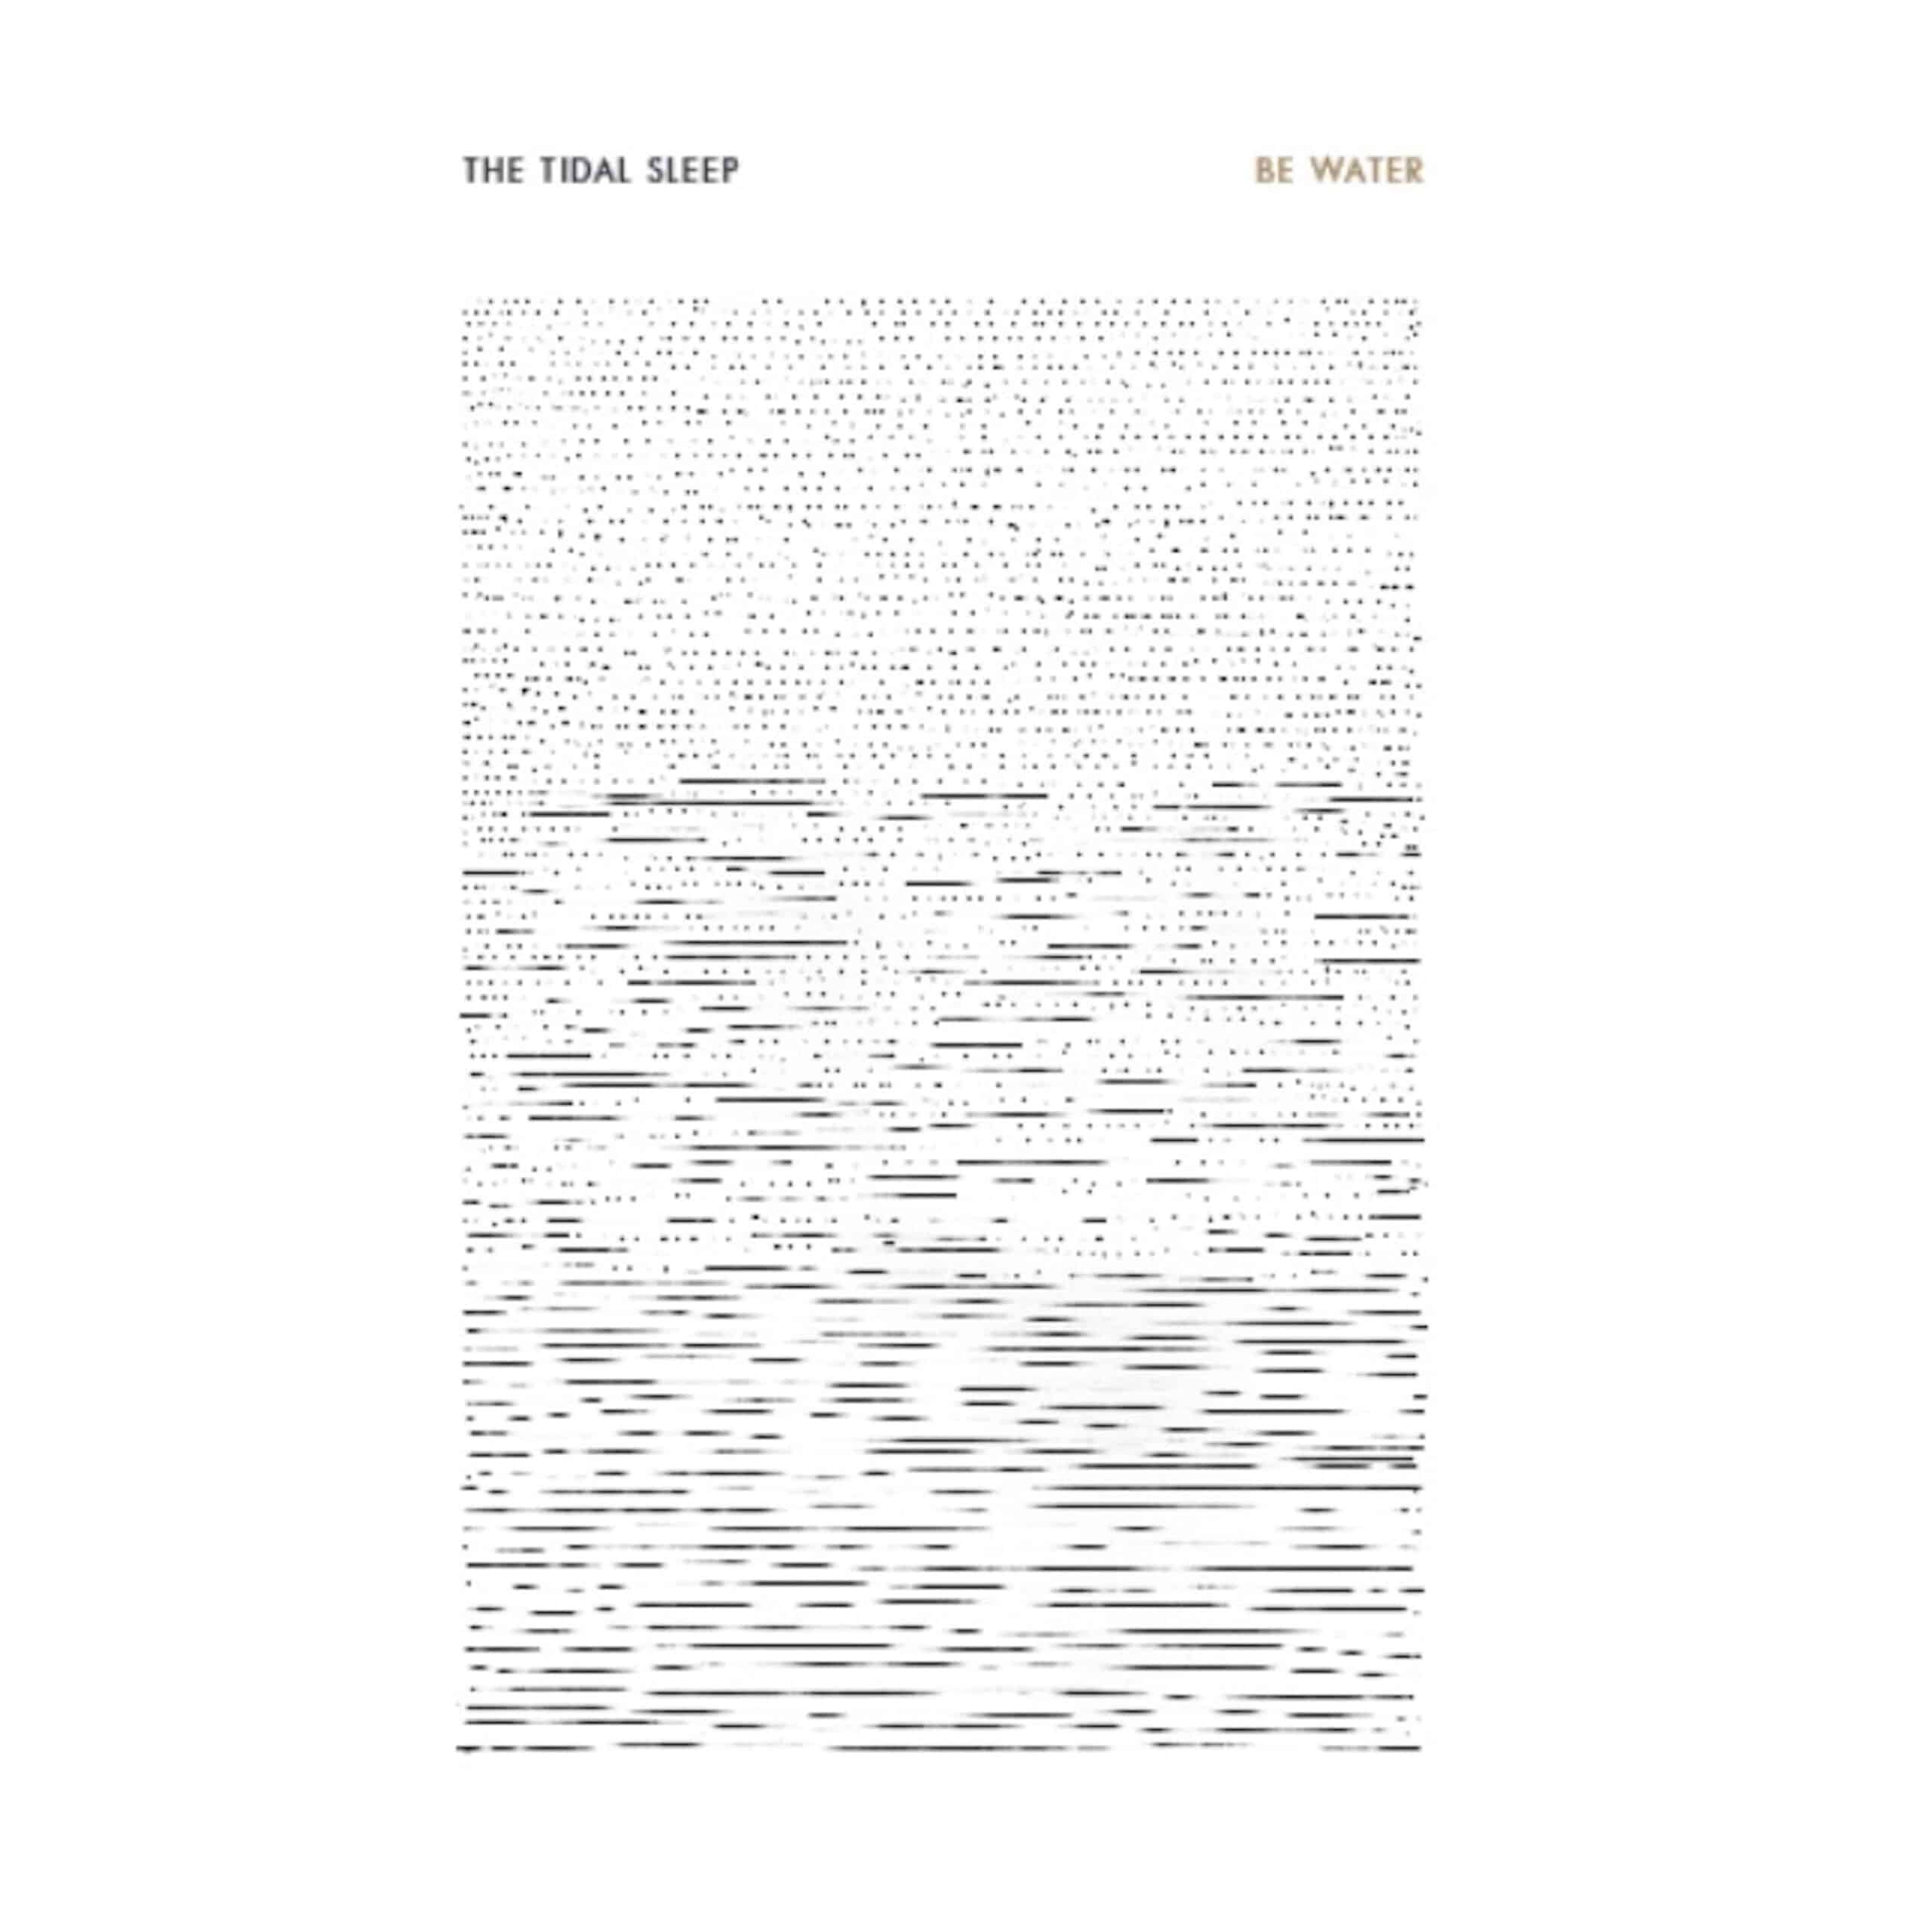 the tidal sleep be water